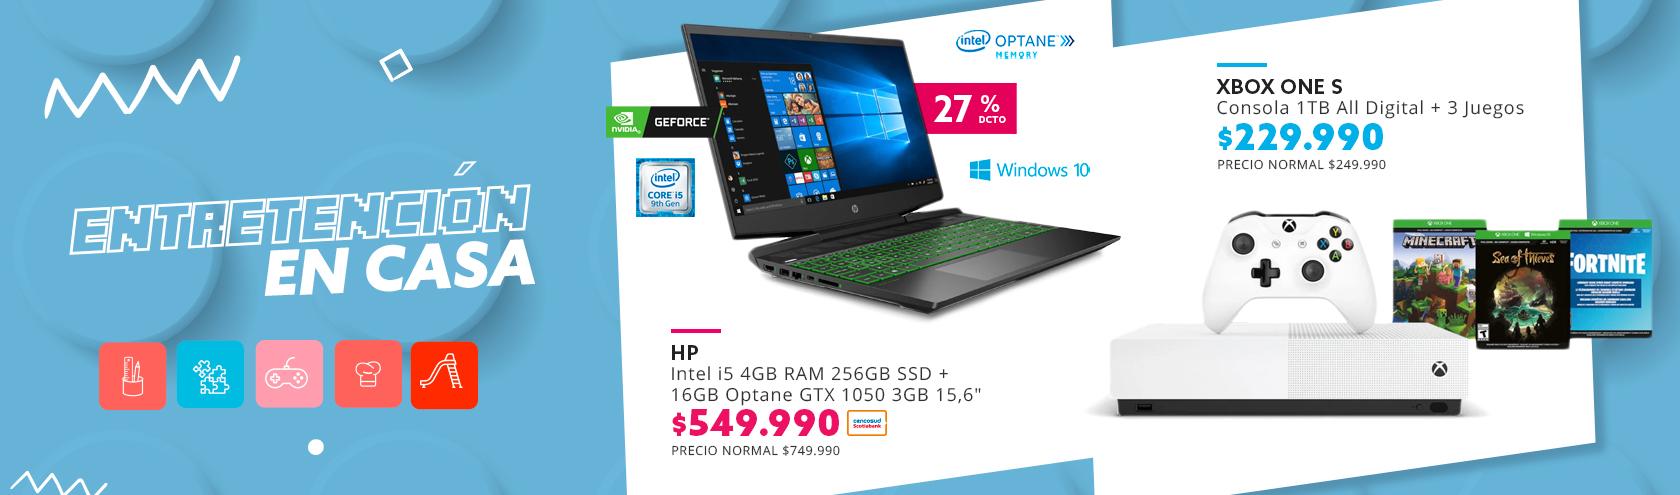 HP Pavilion 15-dk0014la Intel i5 4GB RAM  256 GB SSD + 16 GB Optane 15,6